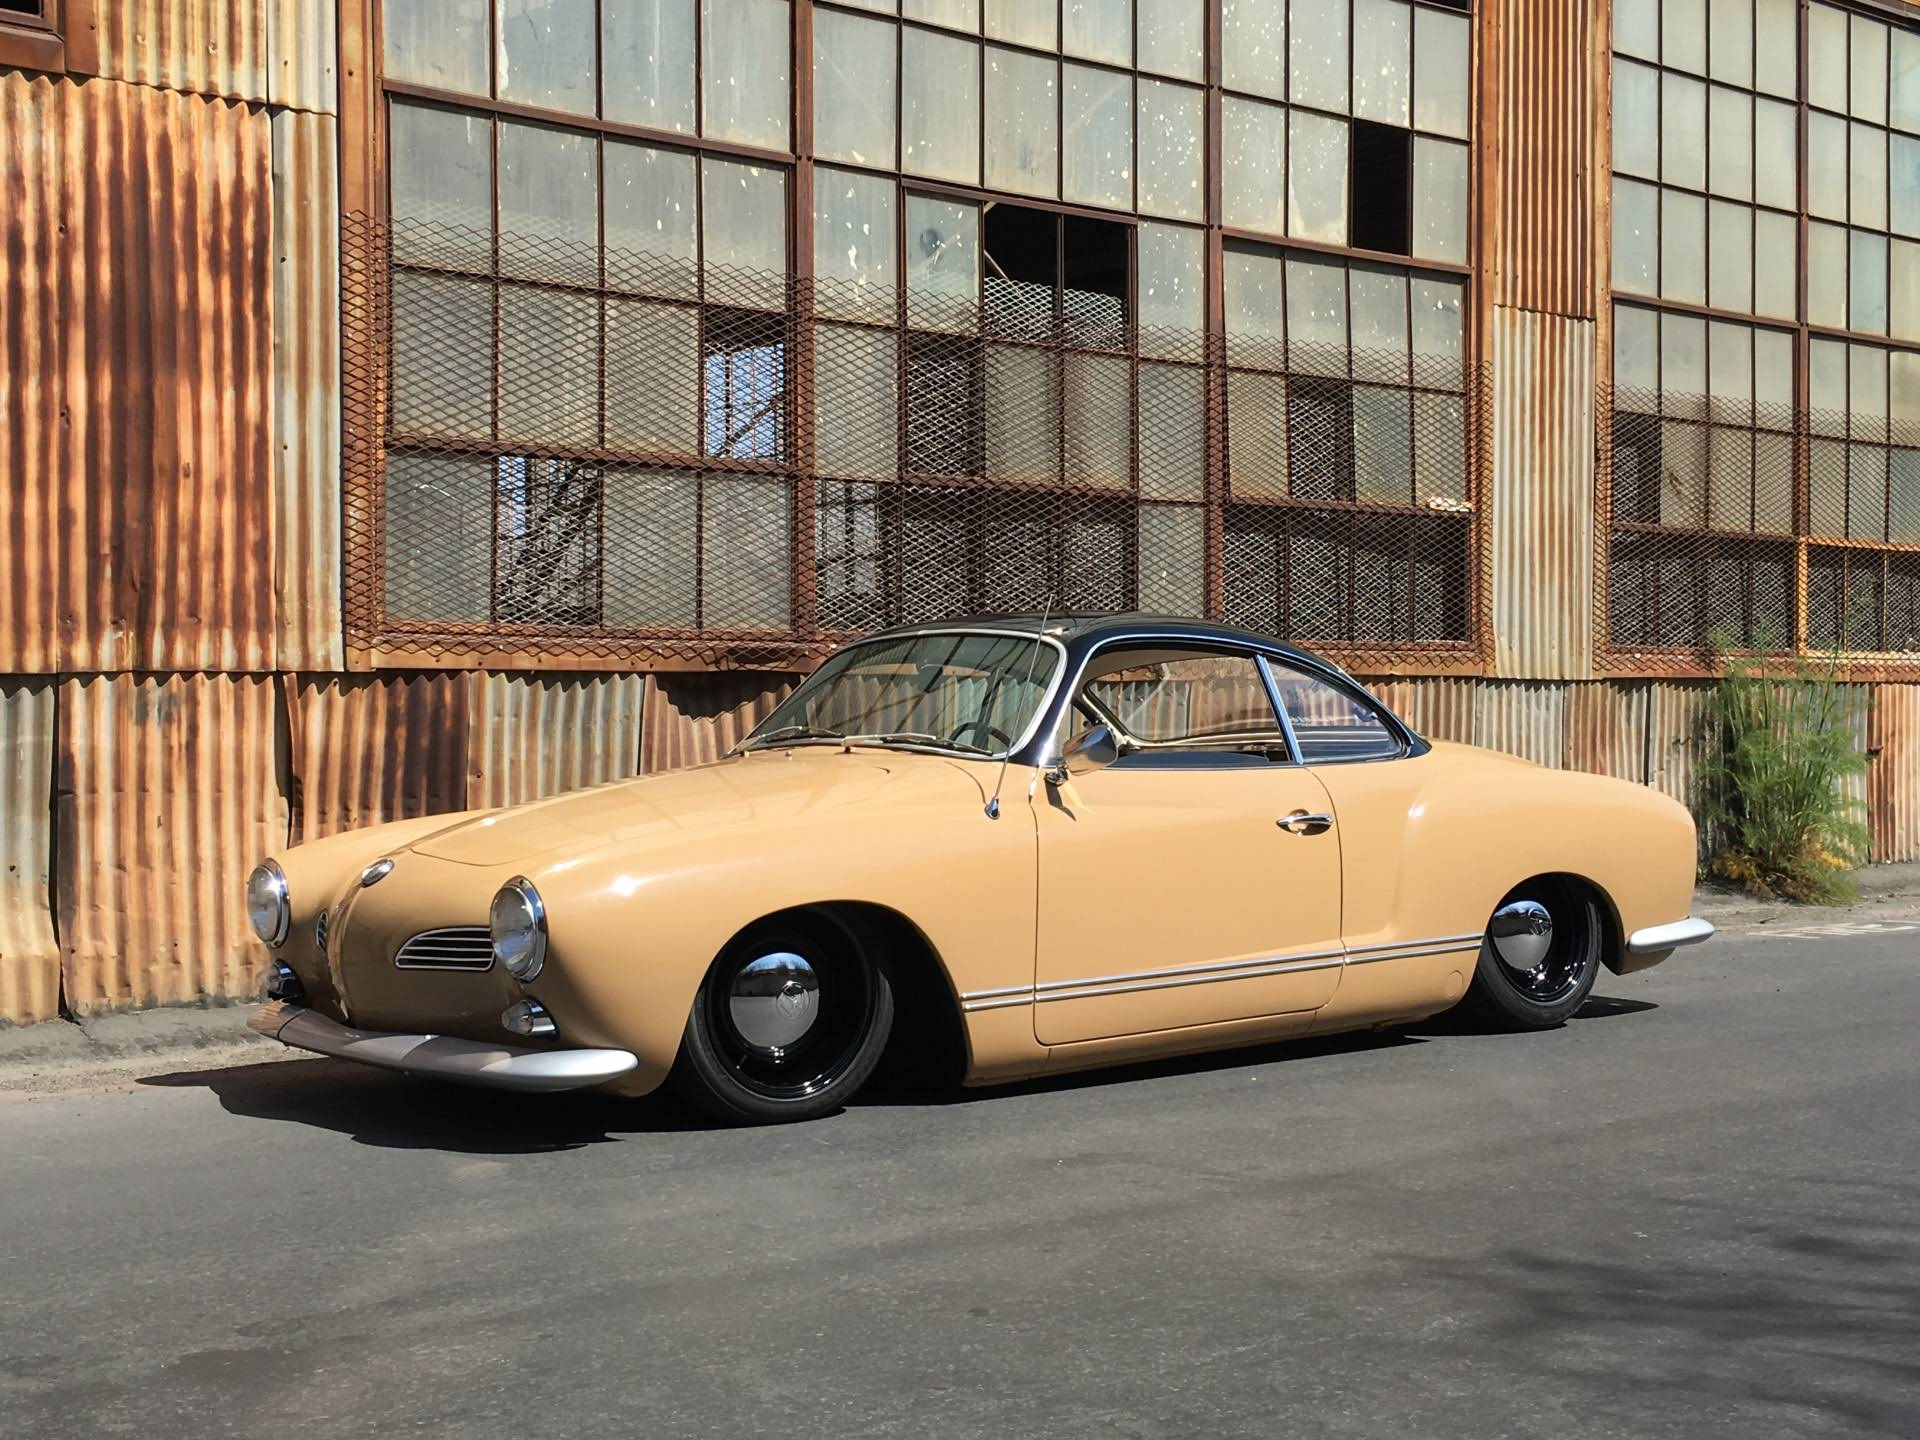 Classic Car Hire for Prom and Graduation - BookAclassic